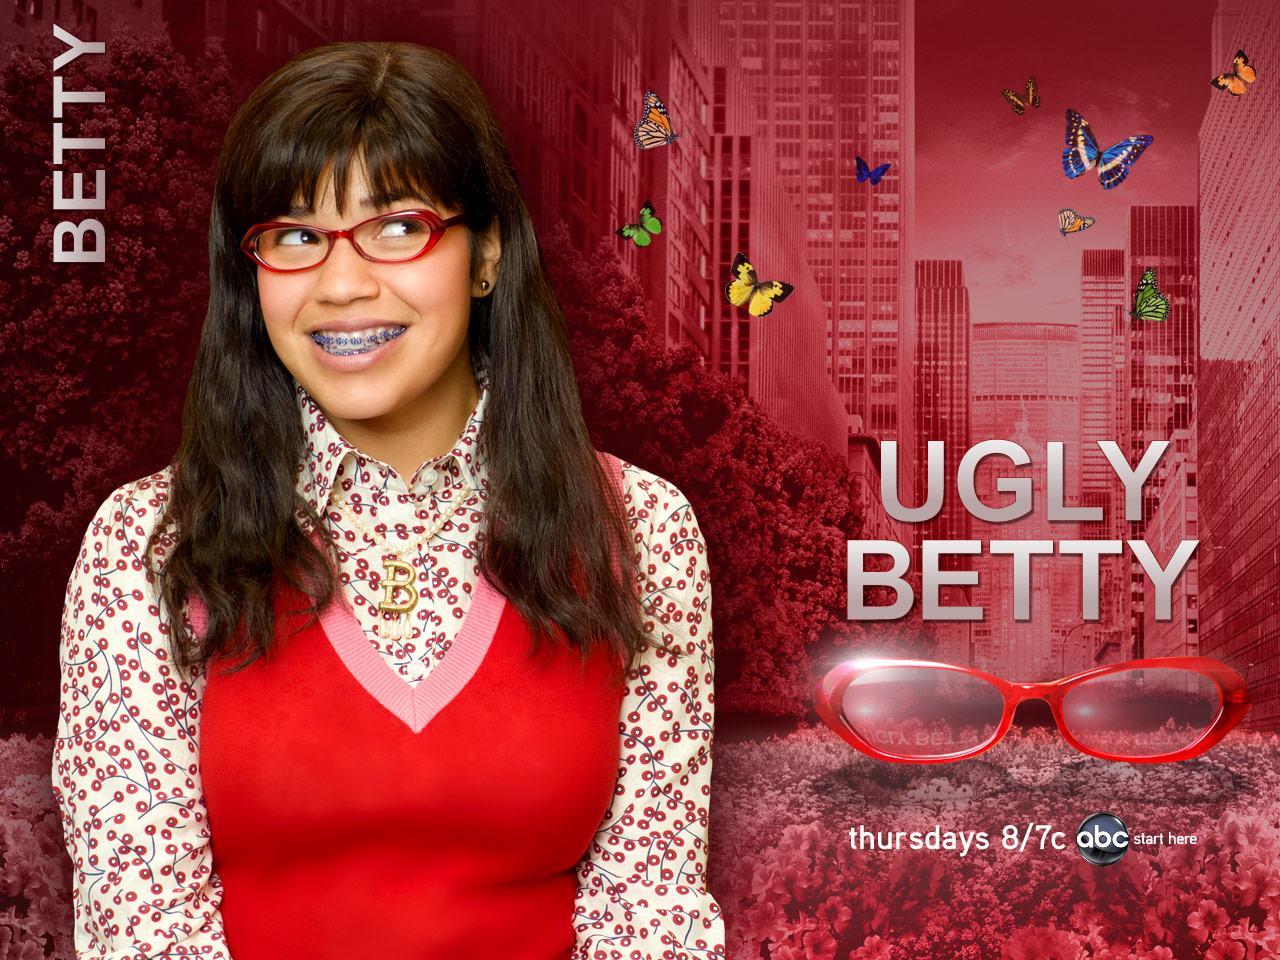 http://4.bp.blogspot.com/_7BZlA0_AkA4/TLh26MLZ0hI/AAAAAAAADZ8/eyBvWDzqc54/s1600/America_Ferrera_in_2006_Ugly_Betty_Wallpaper_1_800.jpg